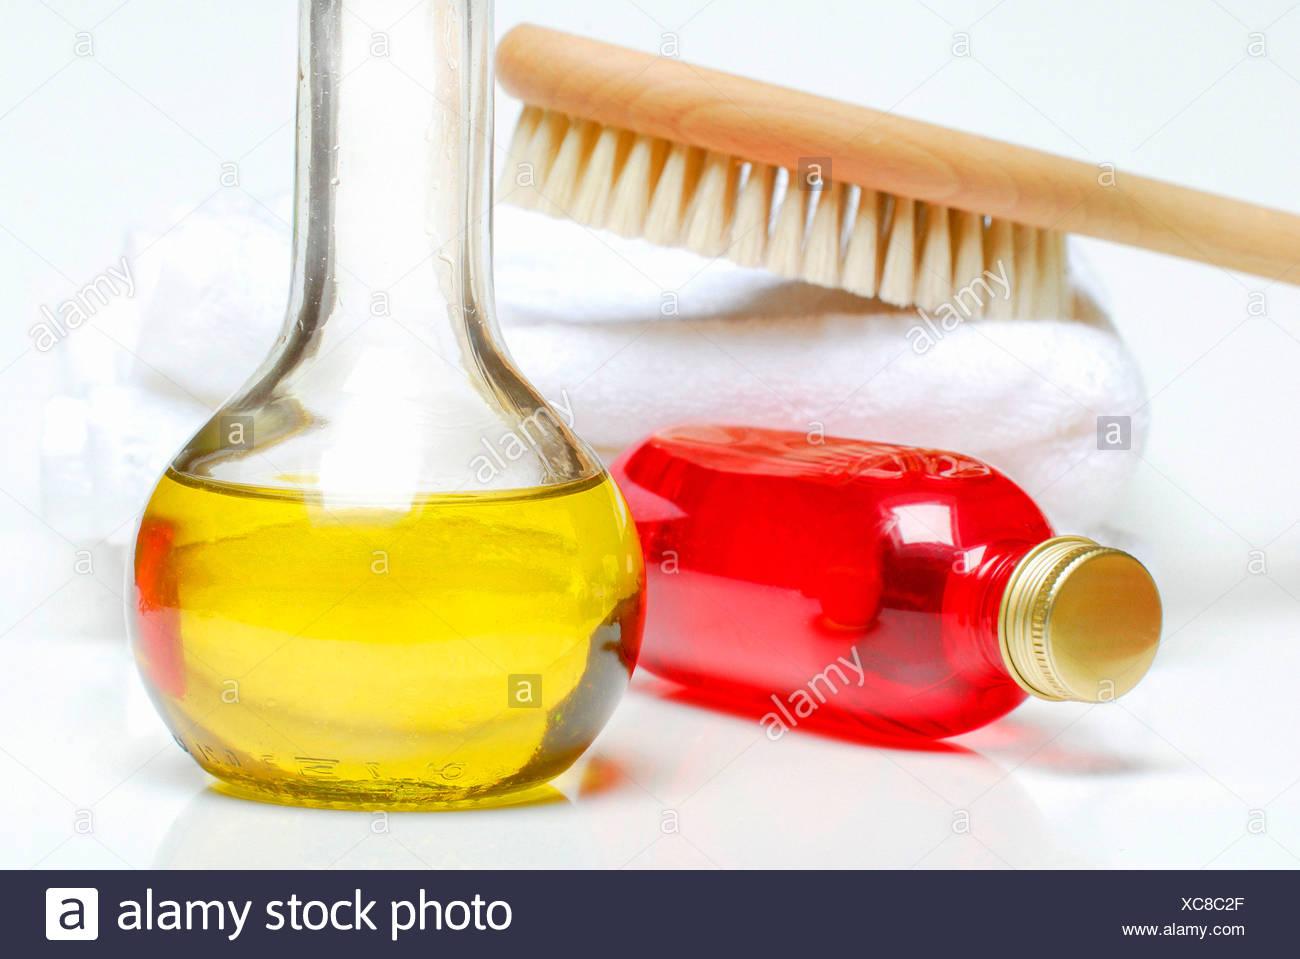 Bath oil, shampoo - Stock Image